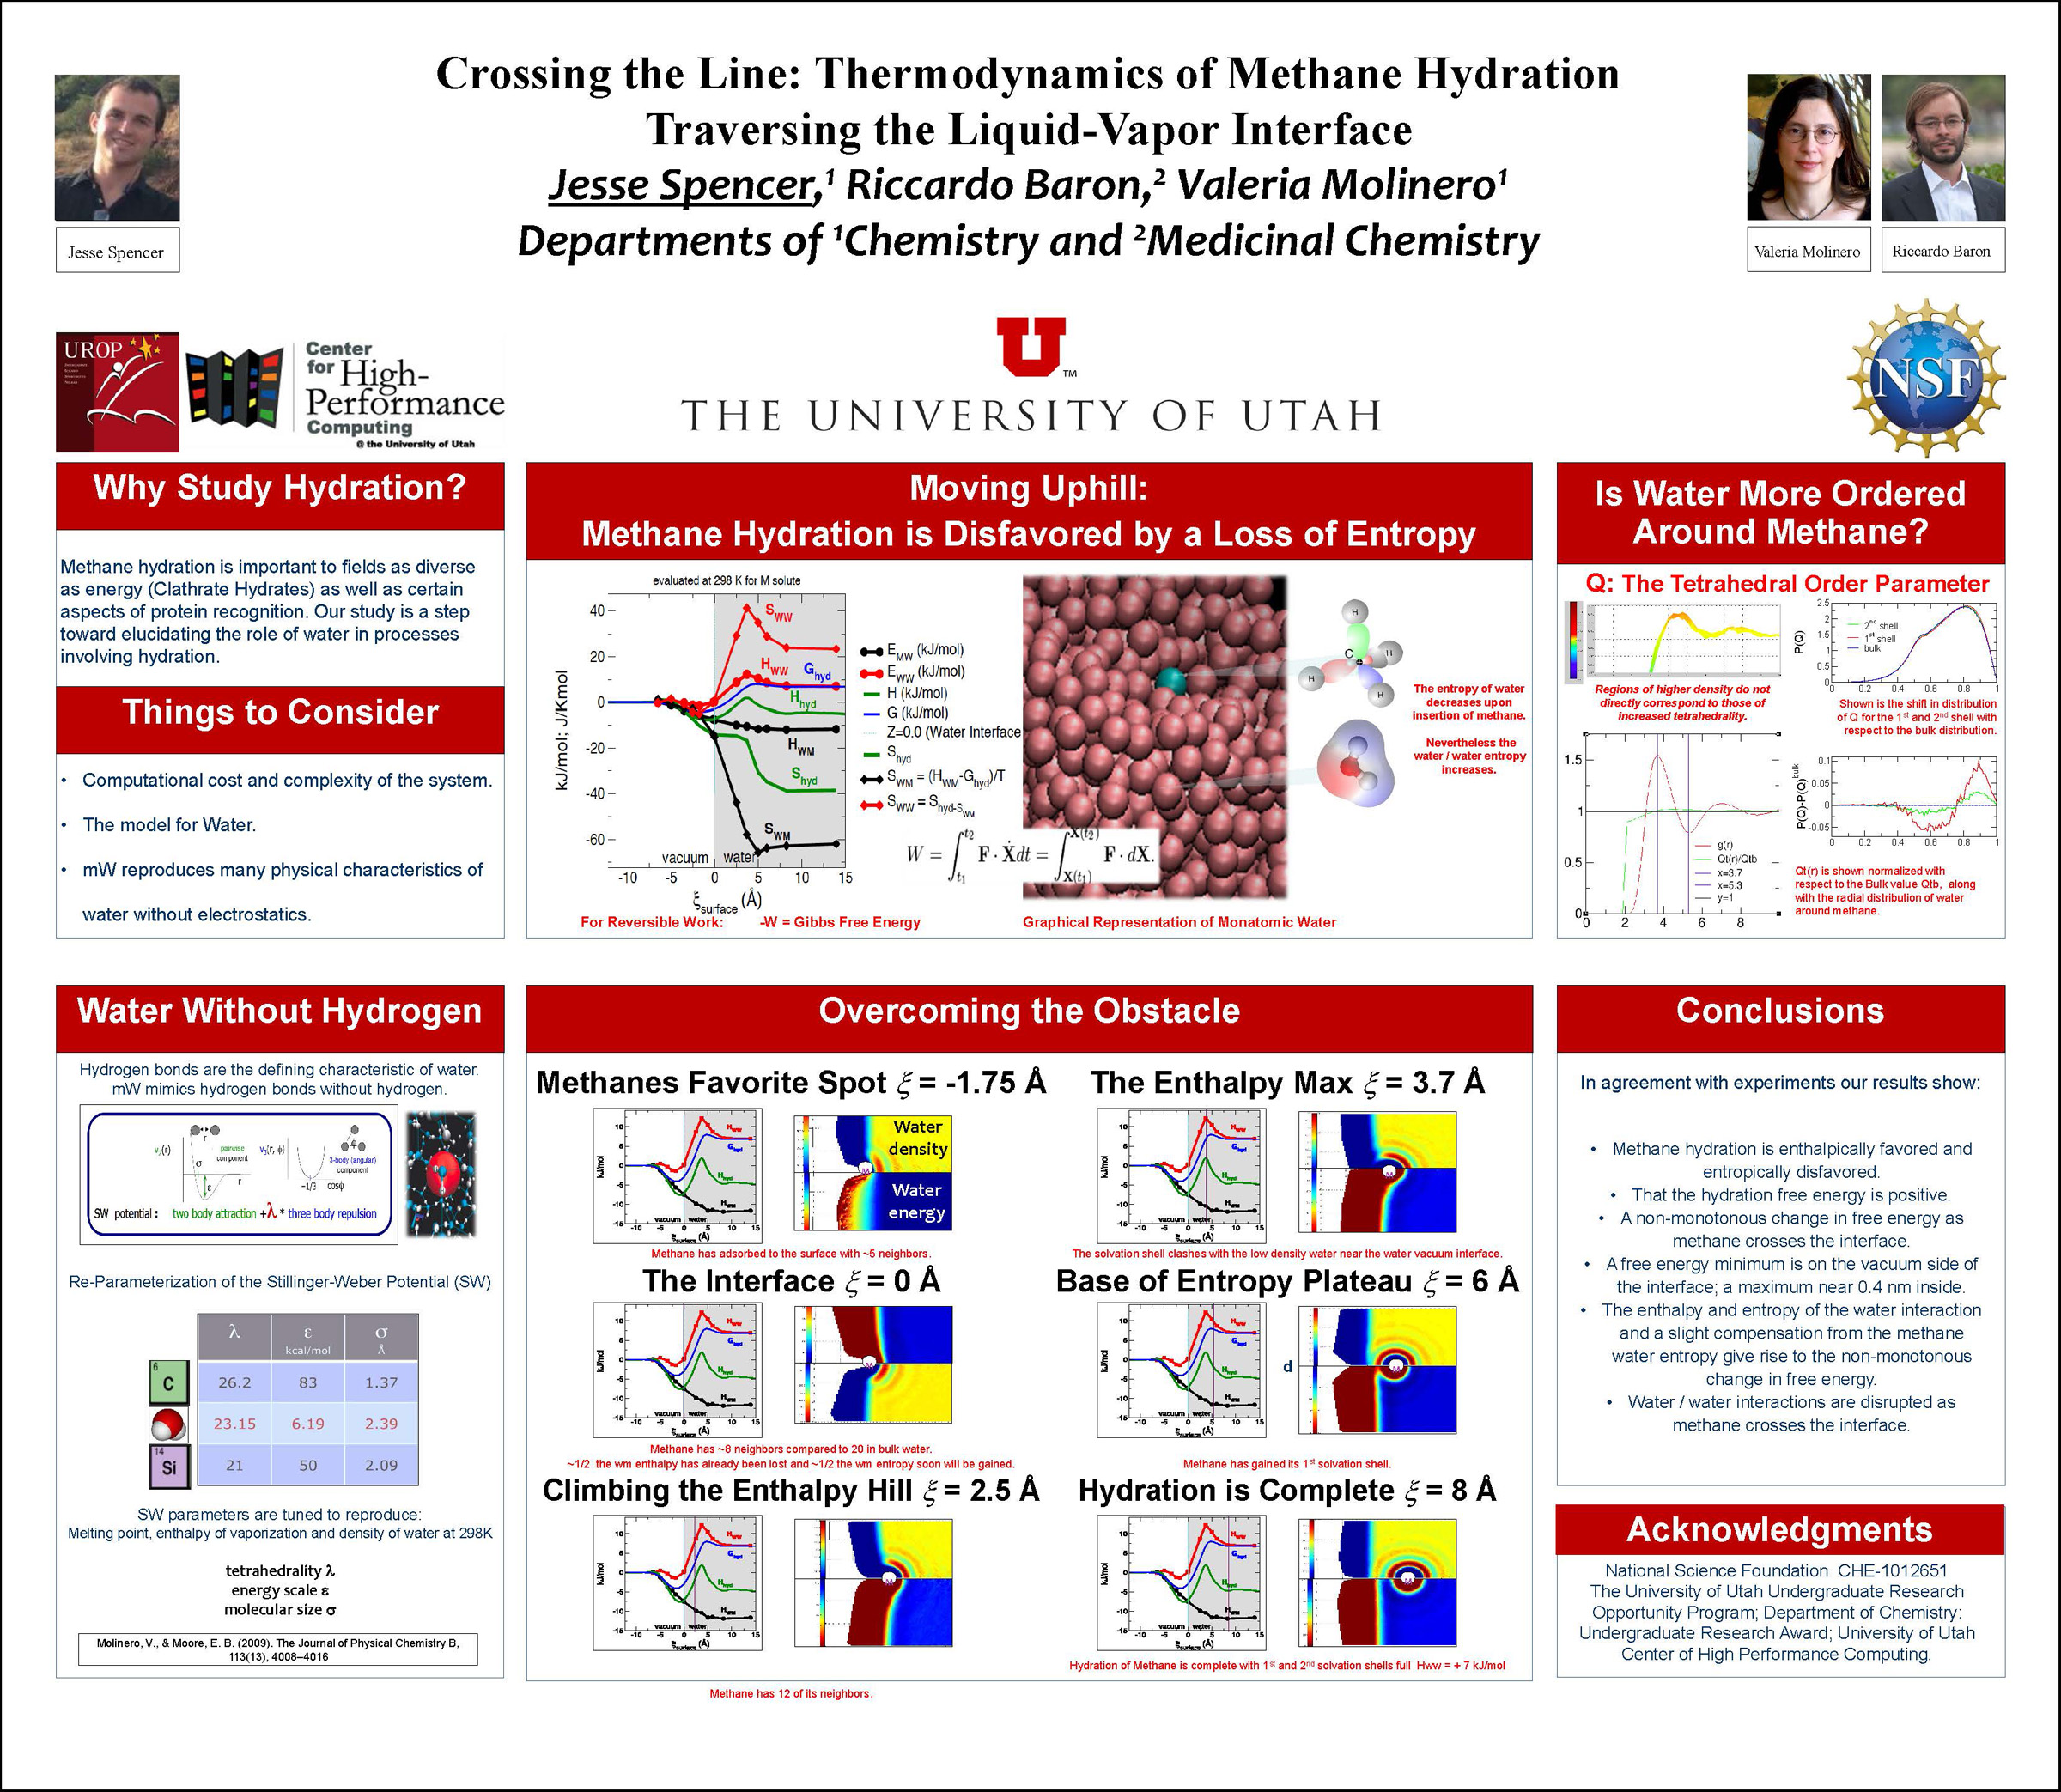 Jesse Spencer (Valeria Molinero, Riccardo Baron) Crossing the Line: Thermodynamics of Methane Hydration Traversing the Liquid-Vapor Interface.